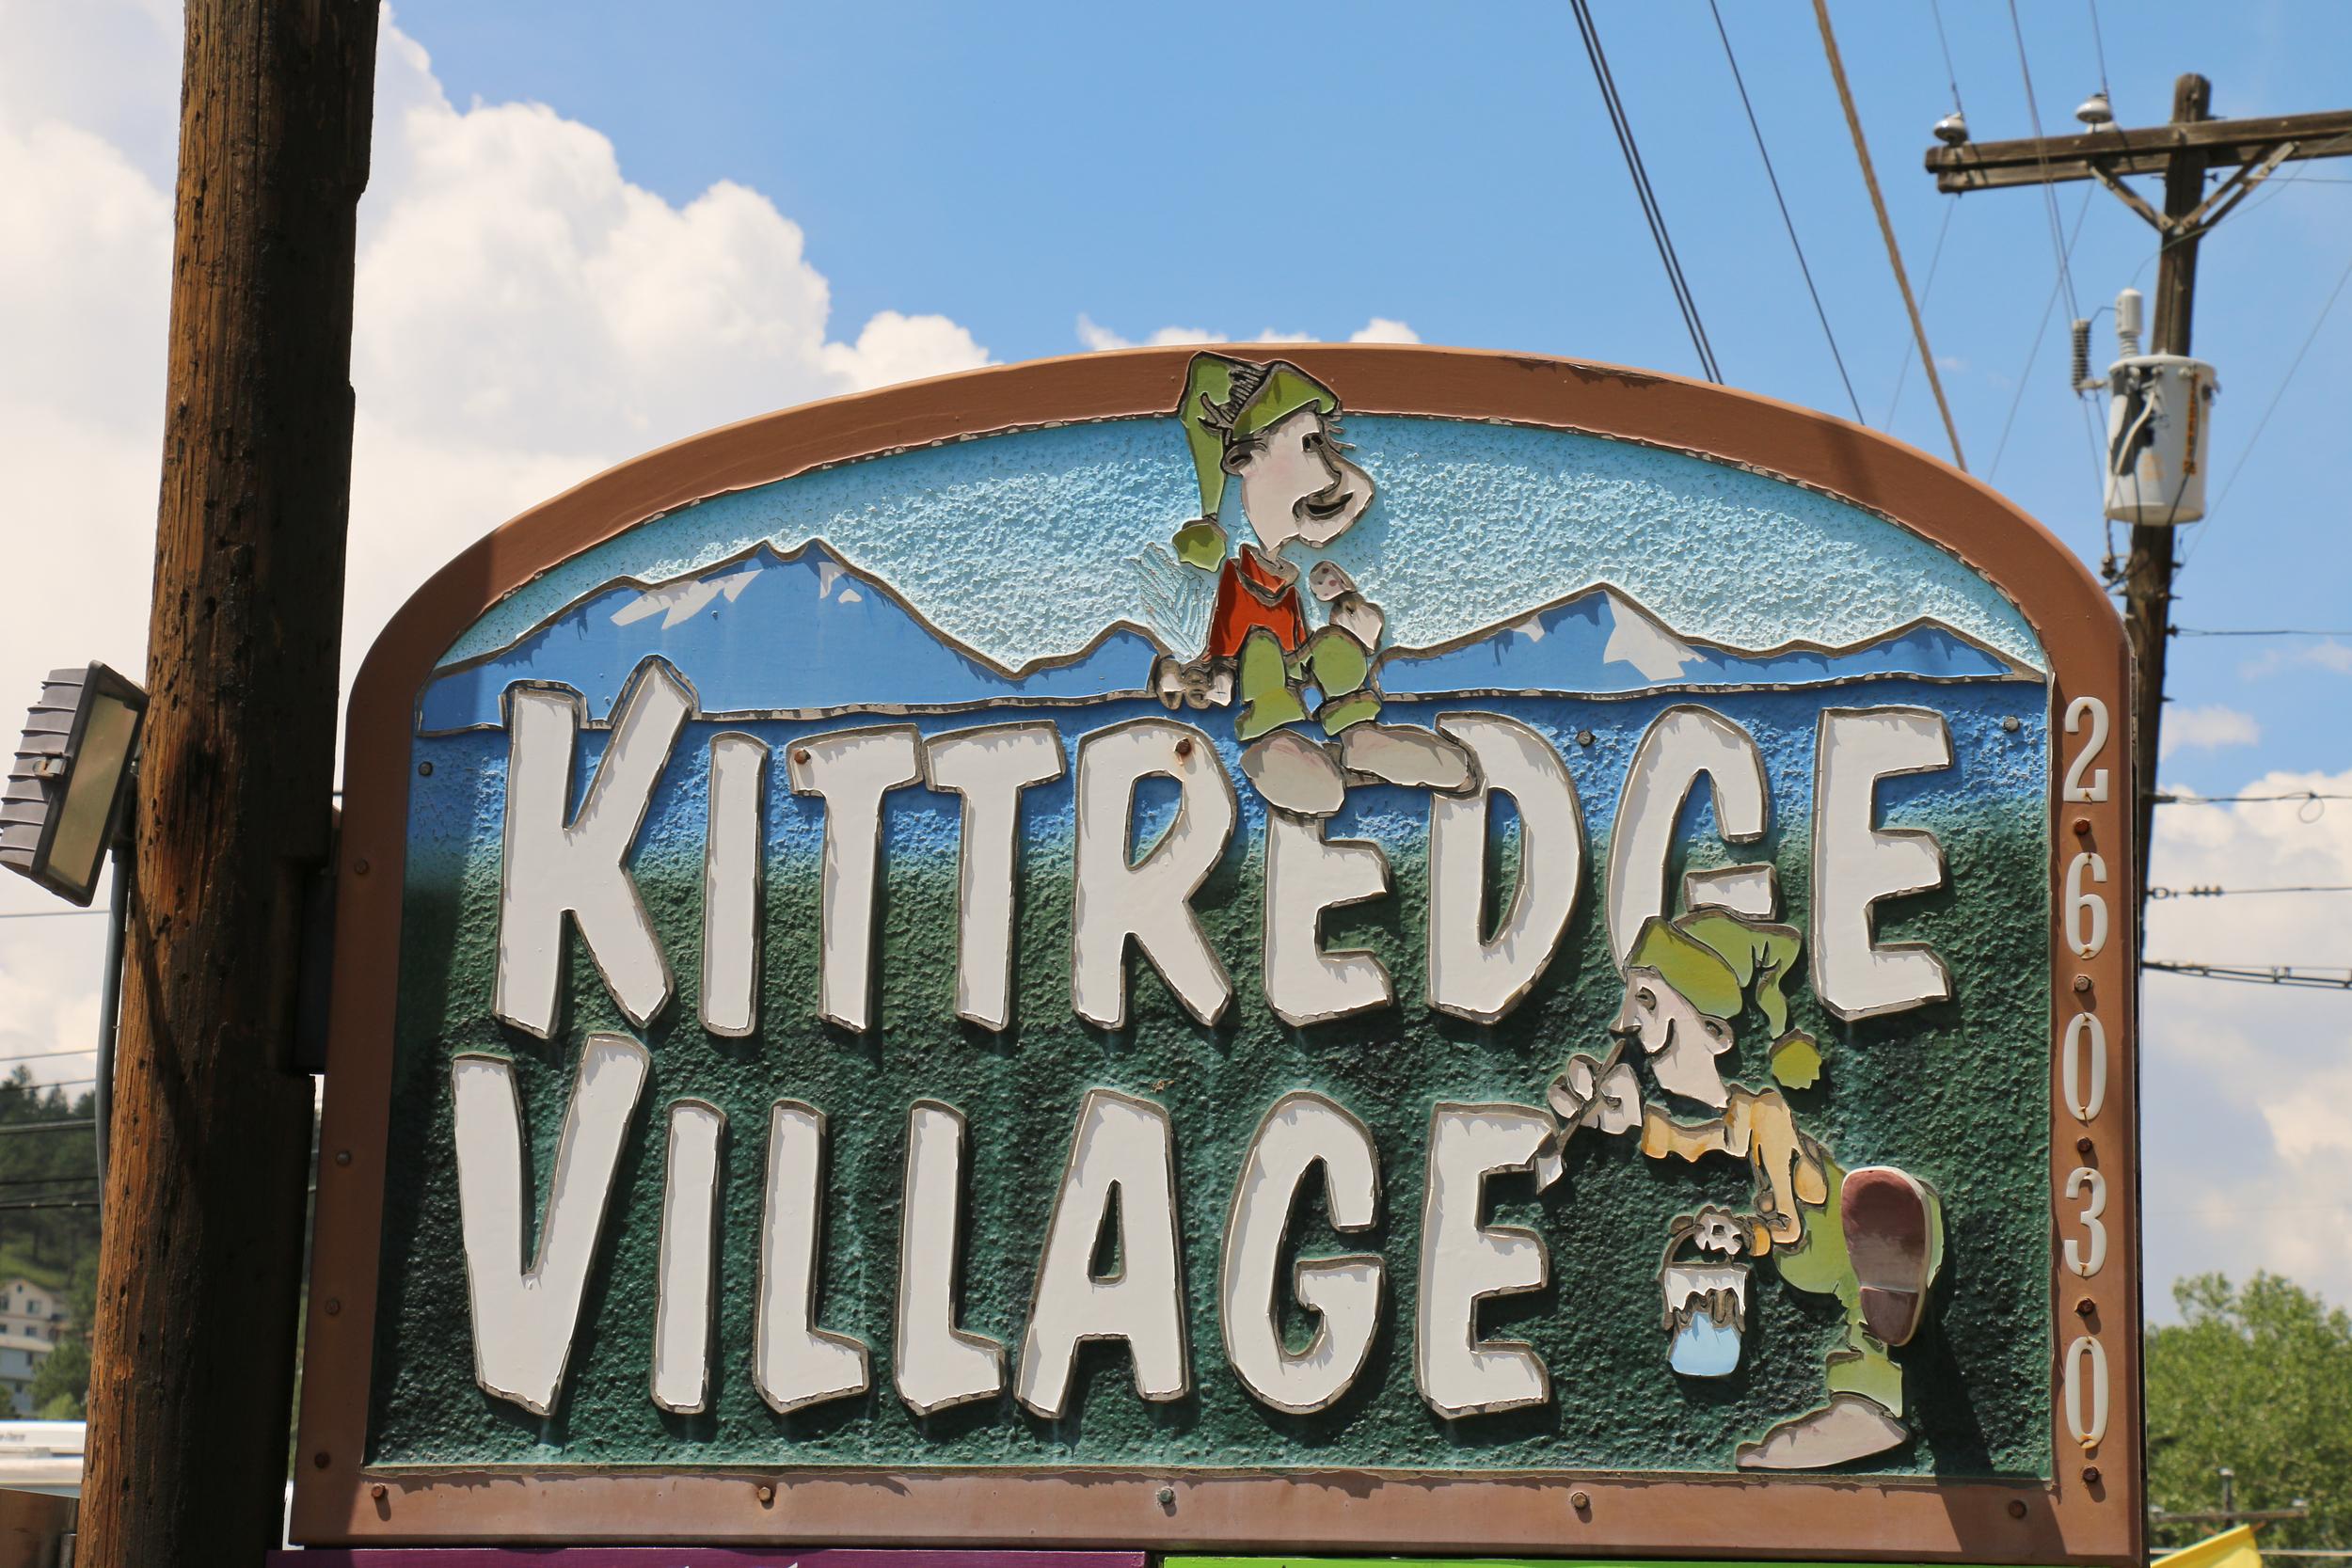 Zipping past Kittredge